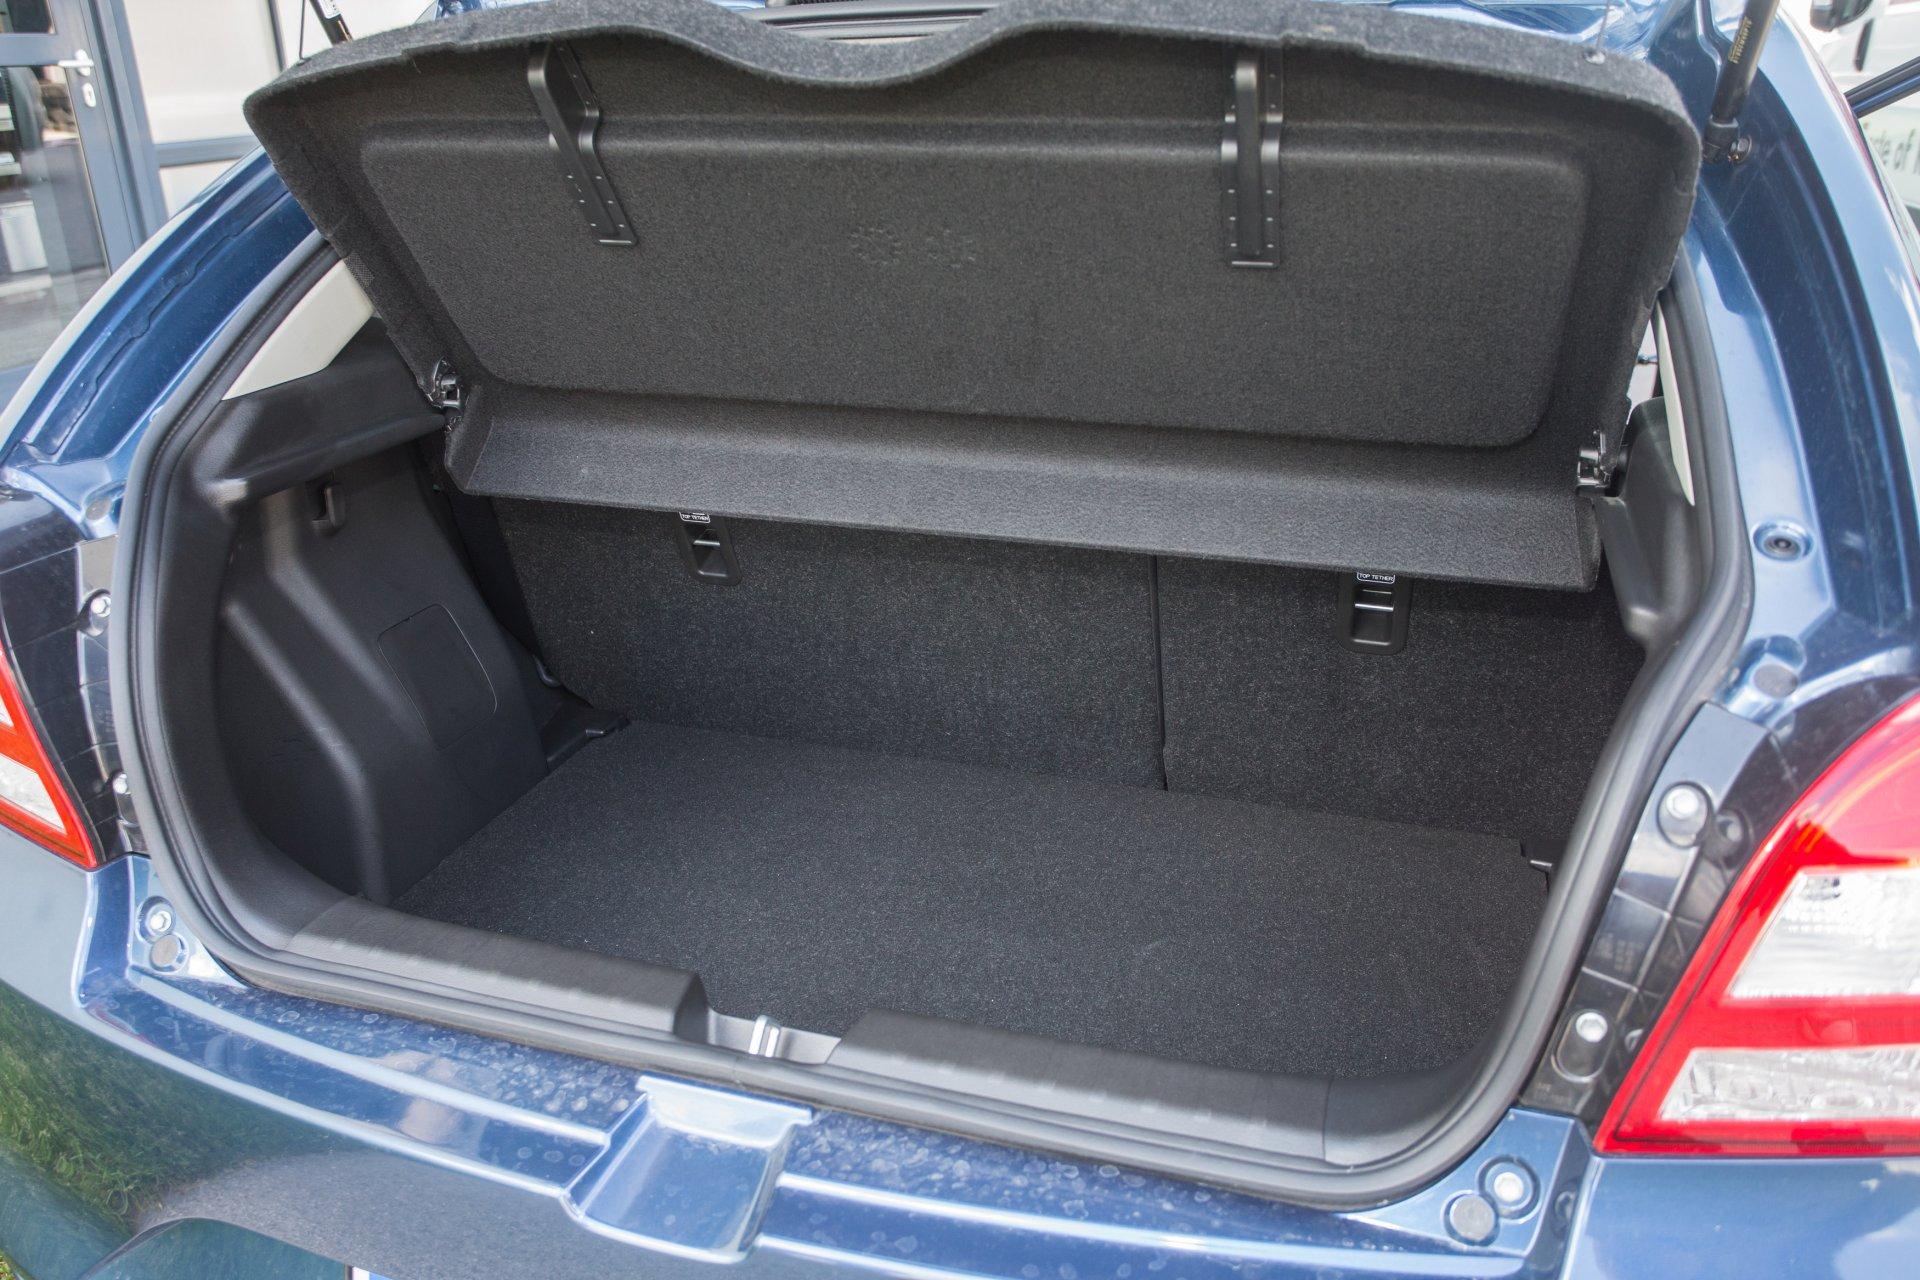 test suzuki baleno 1 2 dj flash alles auto. Black Bedroom Furniture Sets. Home Design Ideas